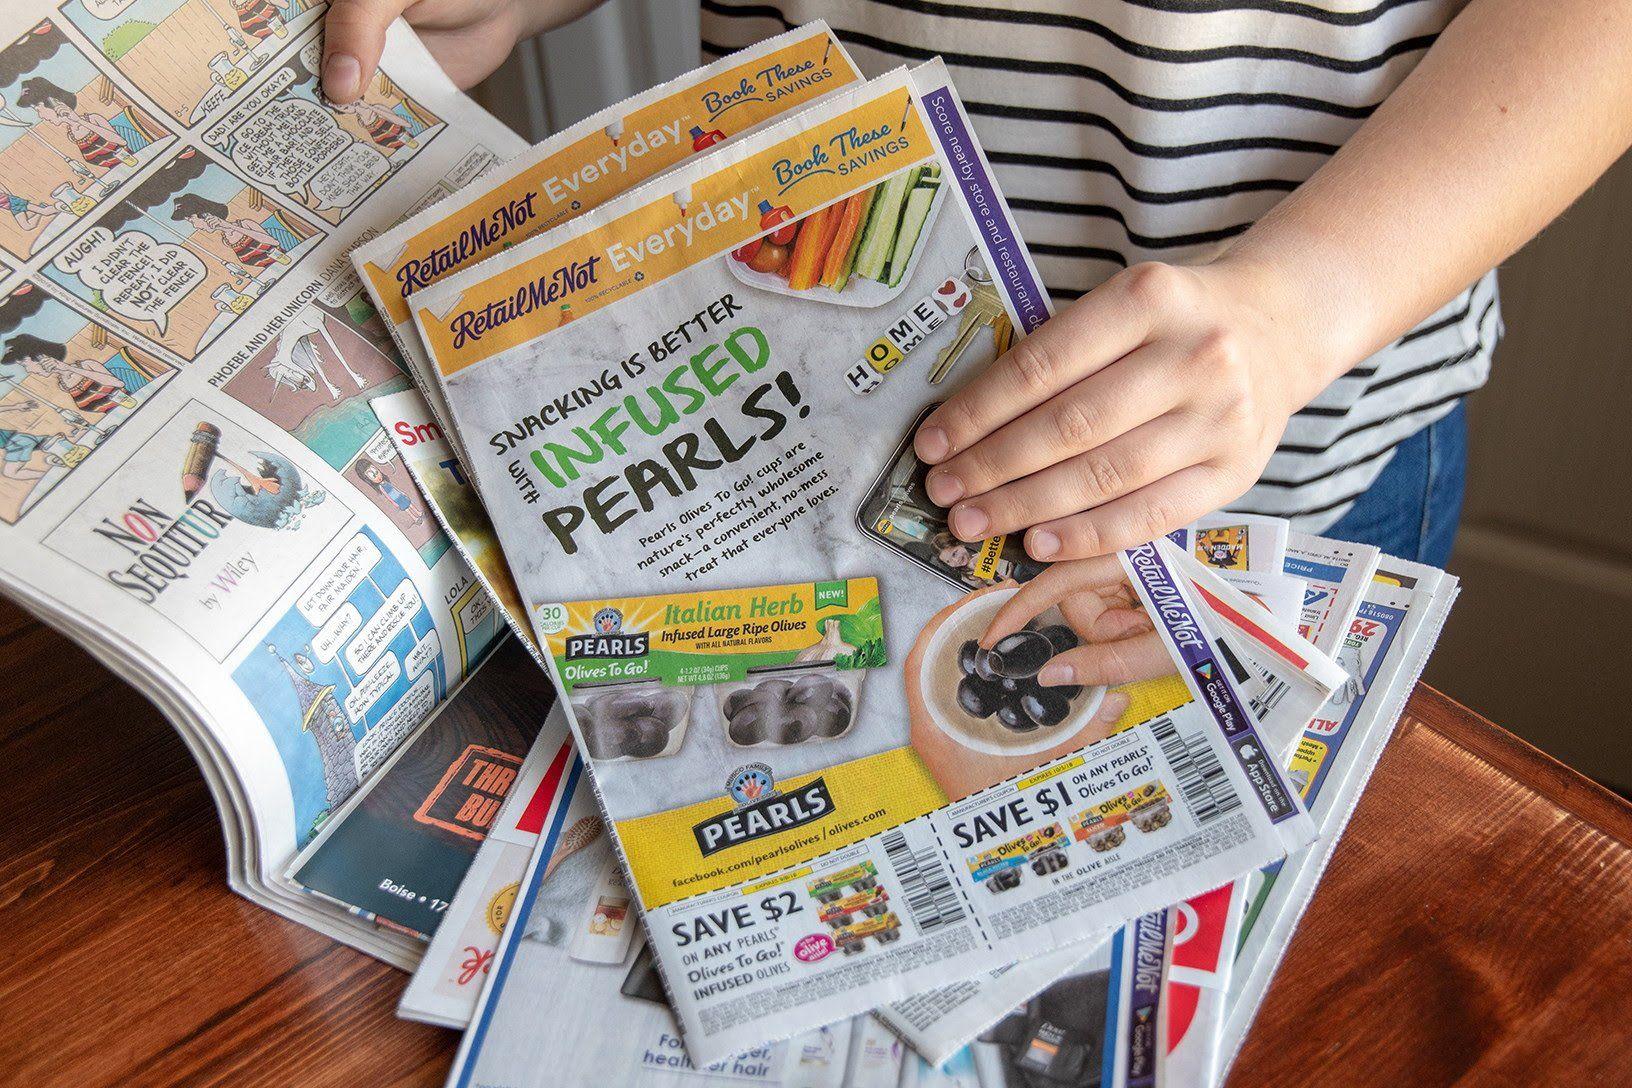 11 Ways To Get Free Sunday Newspaper Coupons Sunday Newspaper Coupons Newspaper Coupon Sunday Newspaper